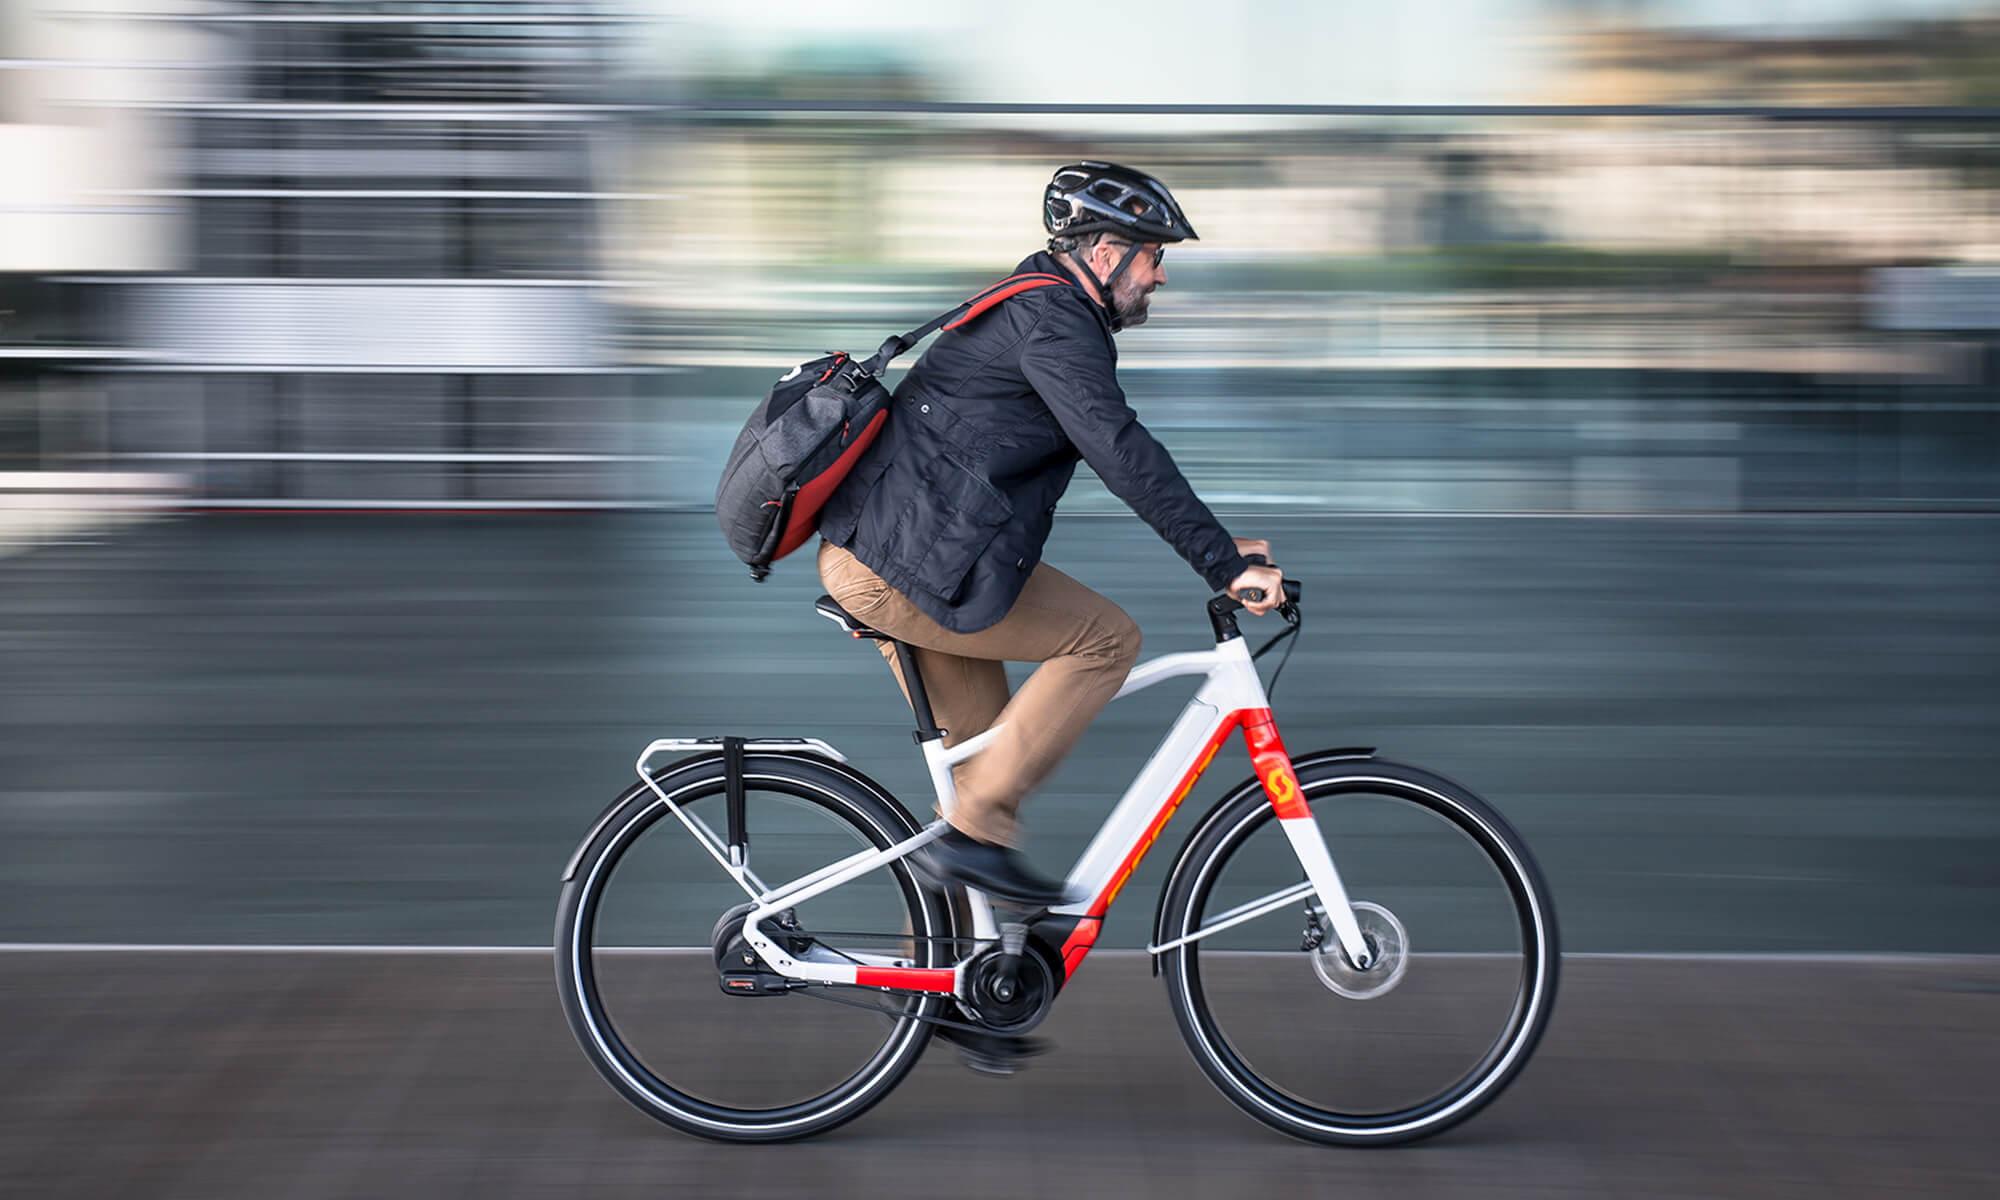 Velolounge - Zürich-Kloten: E-Bike